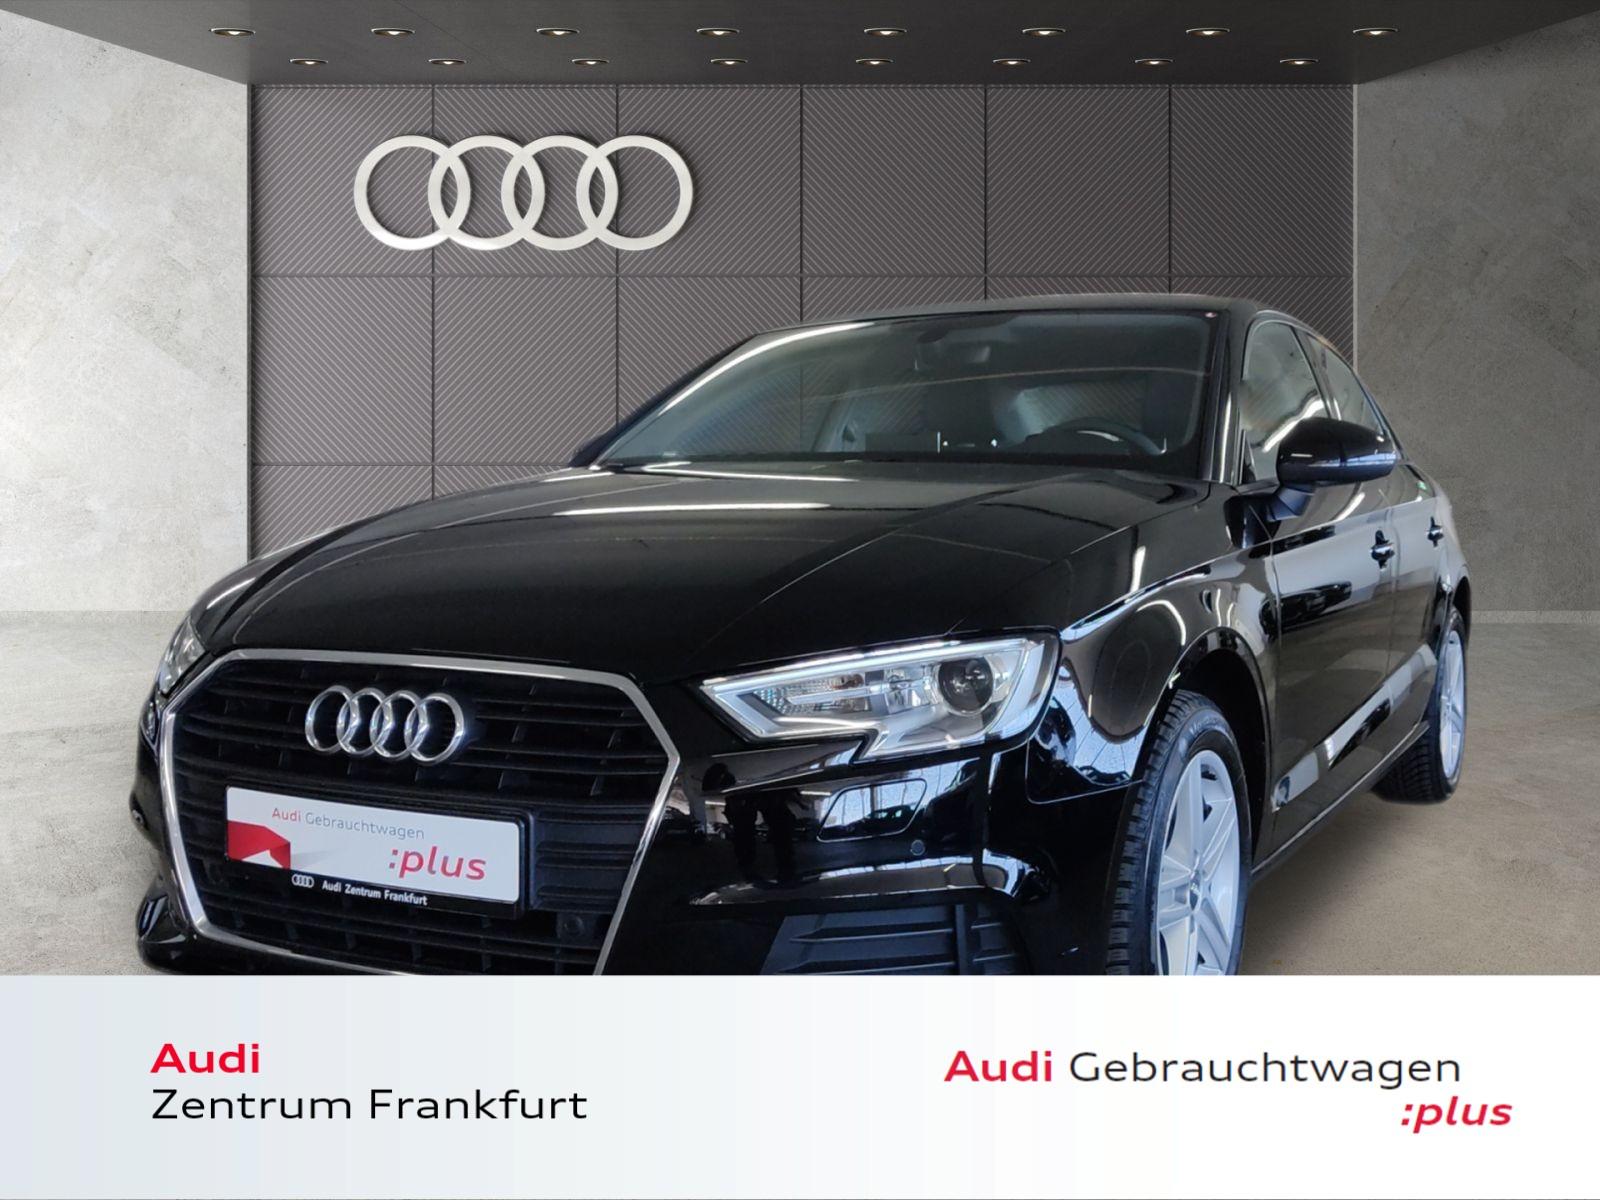 Audi A3 Limousine 30 TFSI Navi Xenon Tempomat PDC Sitzheizung, Jahr 2019, Benzin